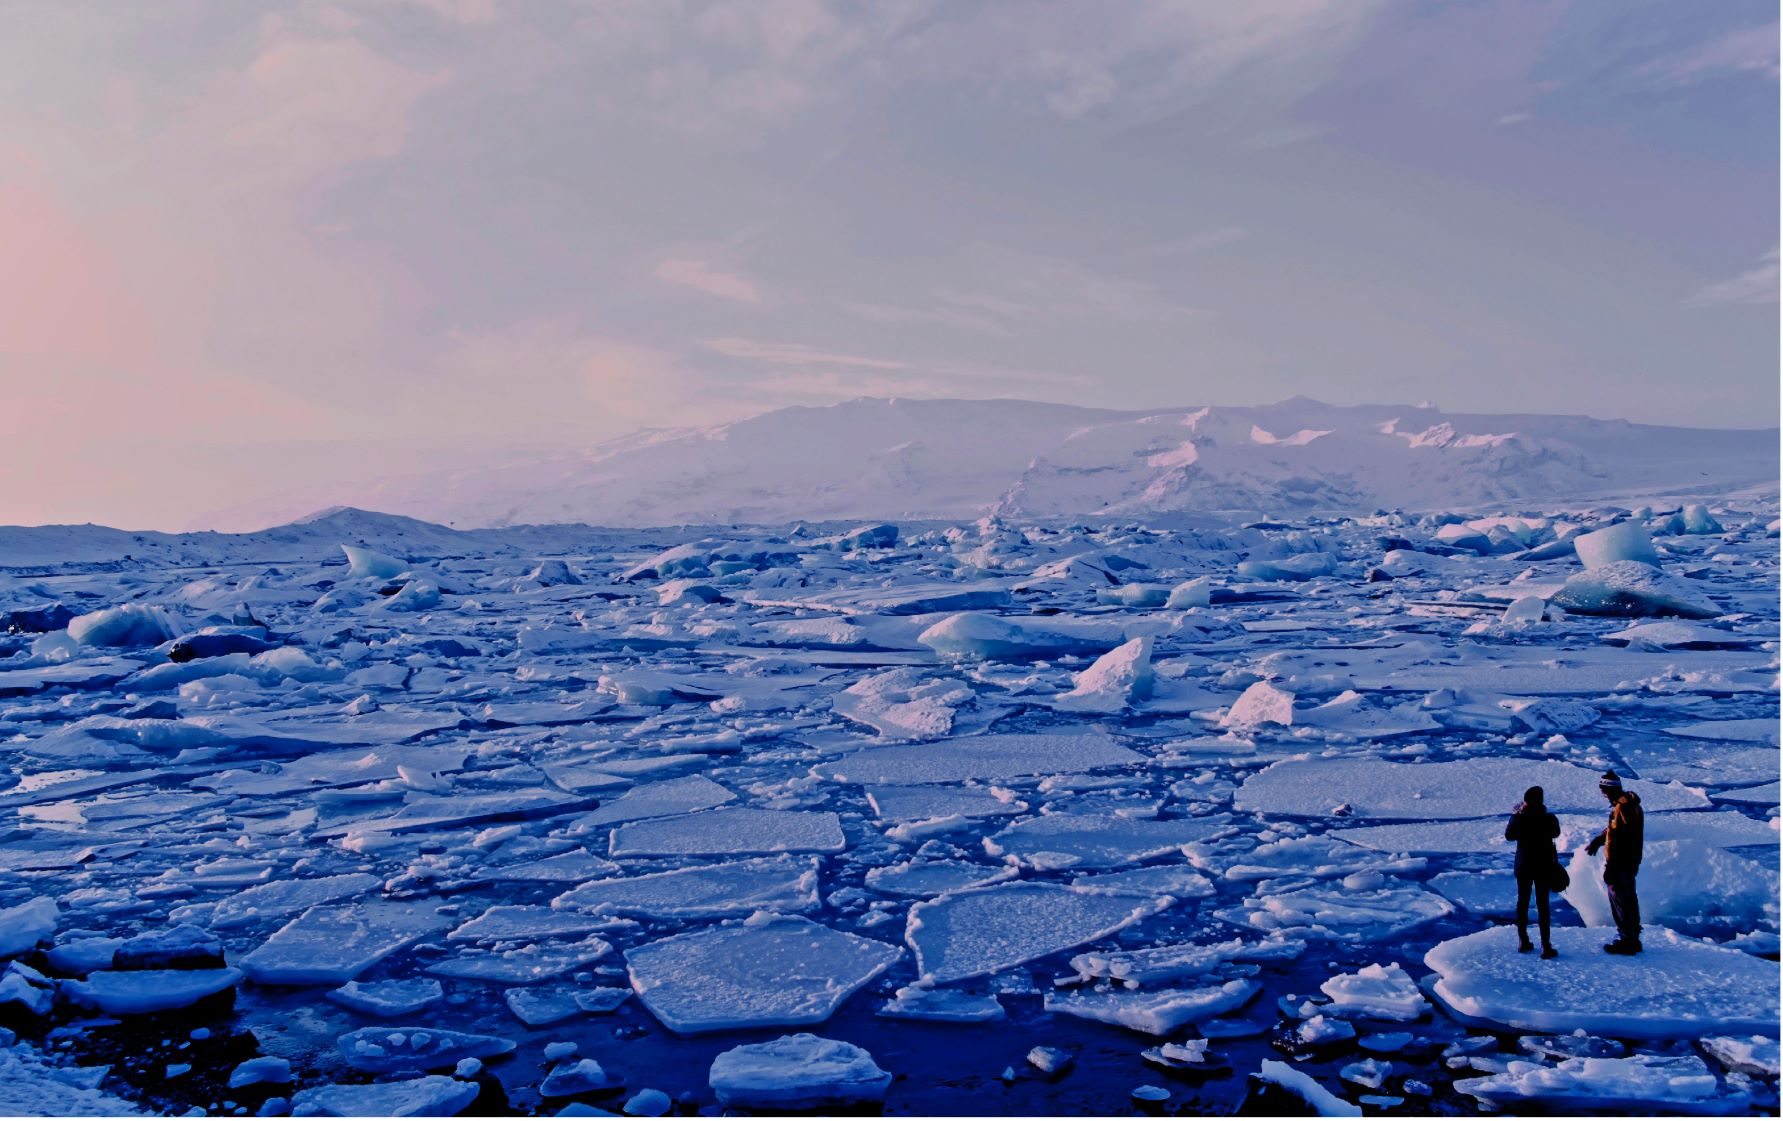 Photo of melting ice sheet on ocean